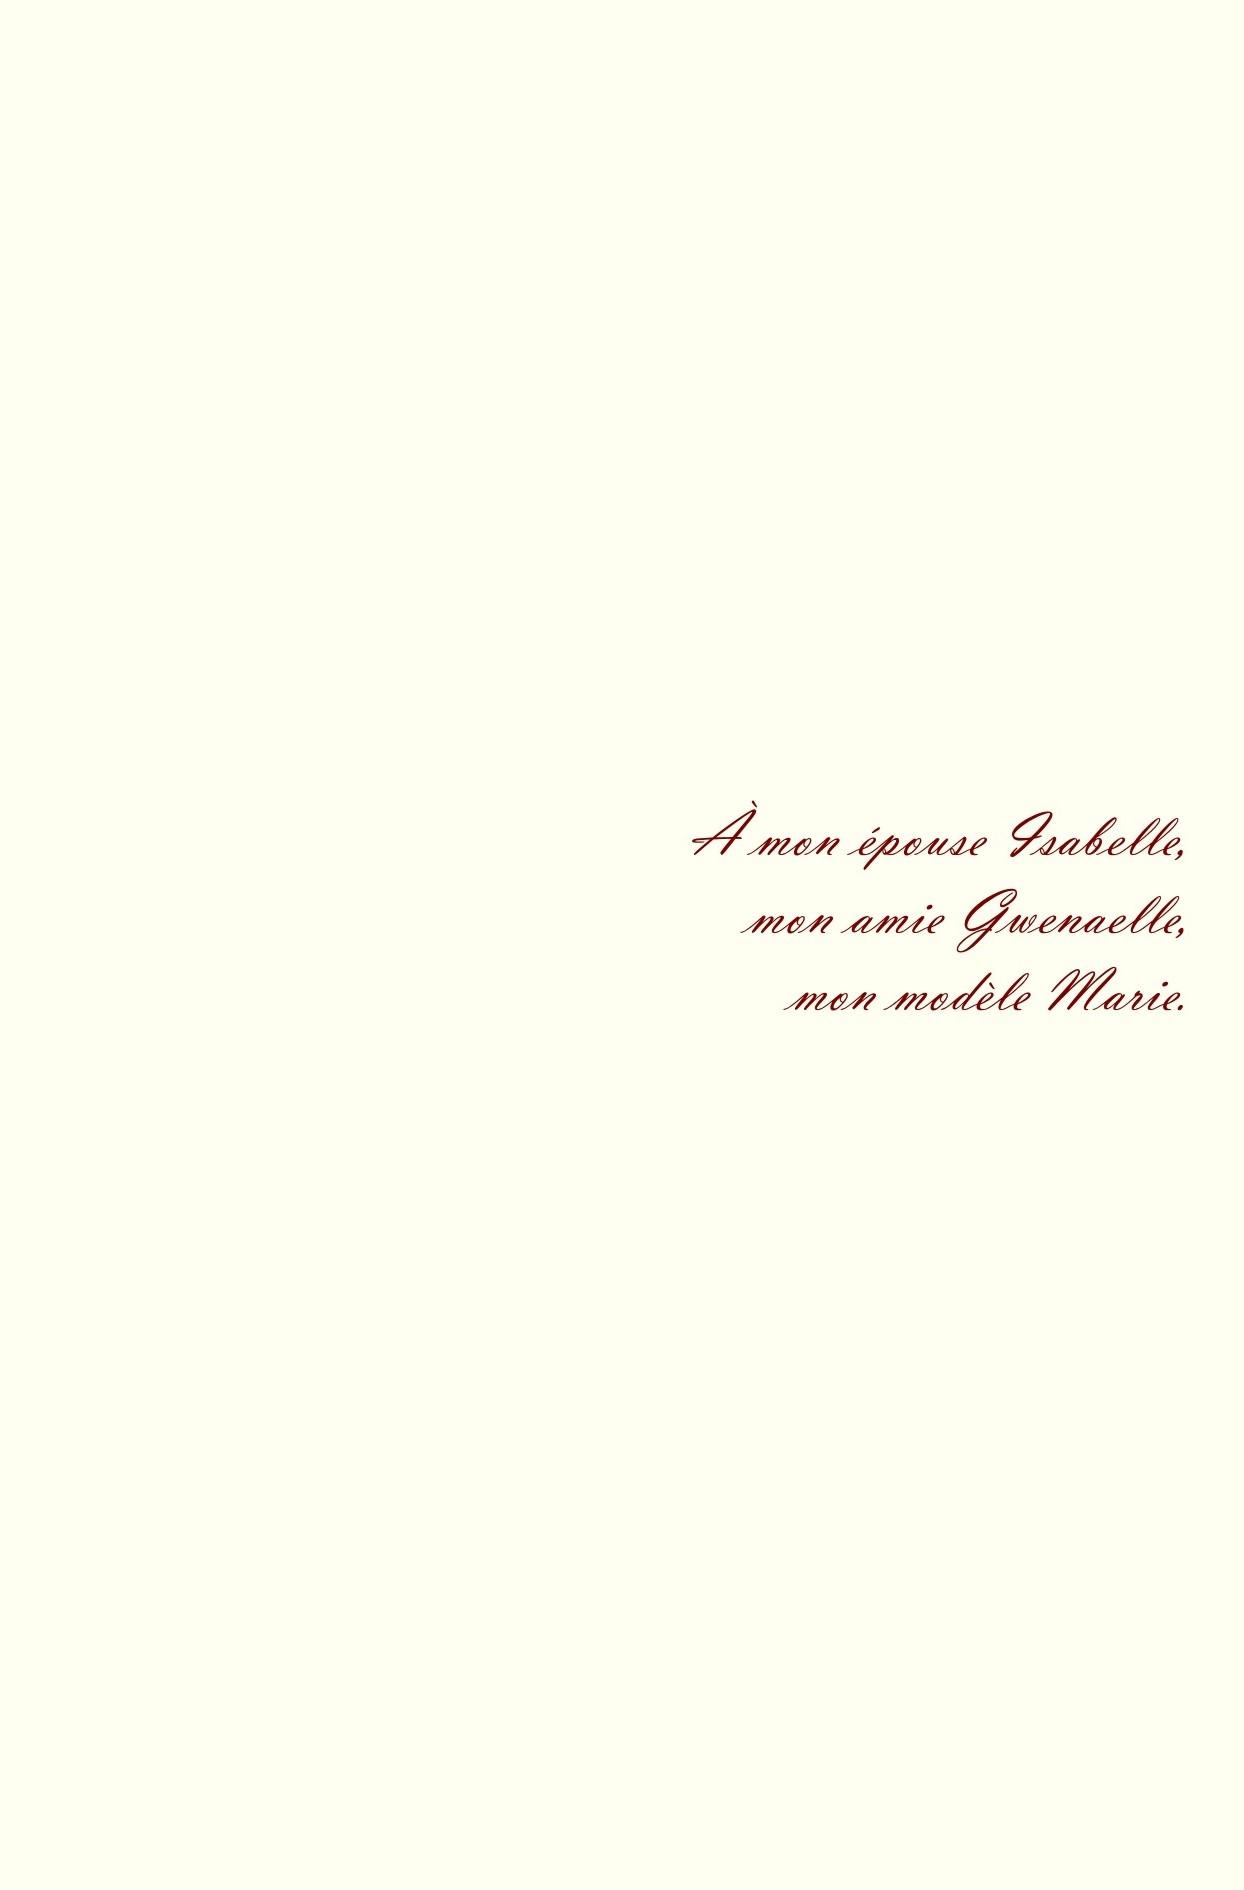 Recueil du rossignol poeme et sanguine de jean joseph chevalier 2